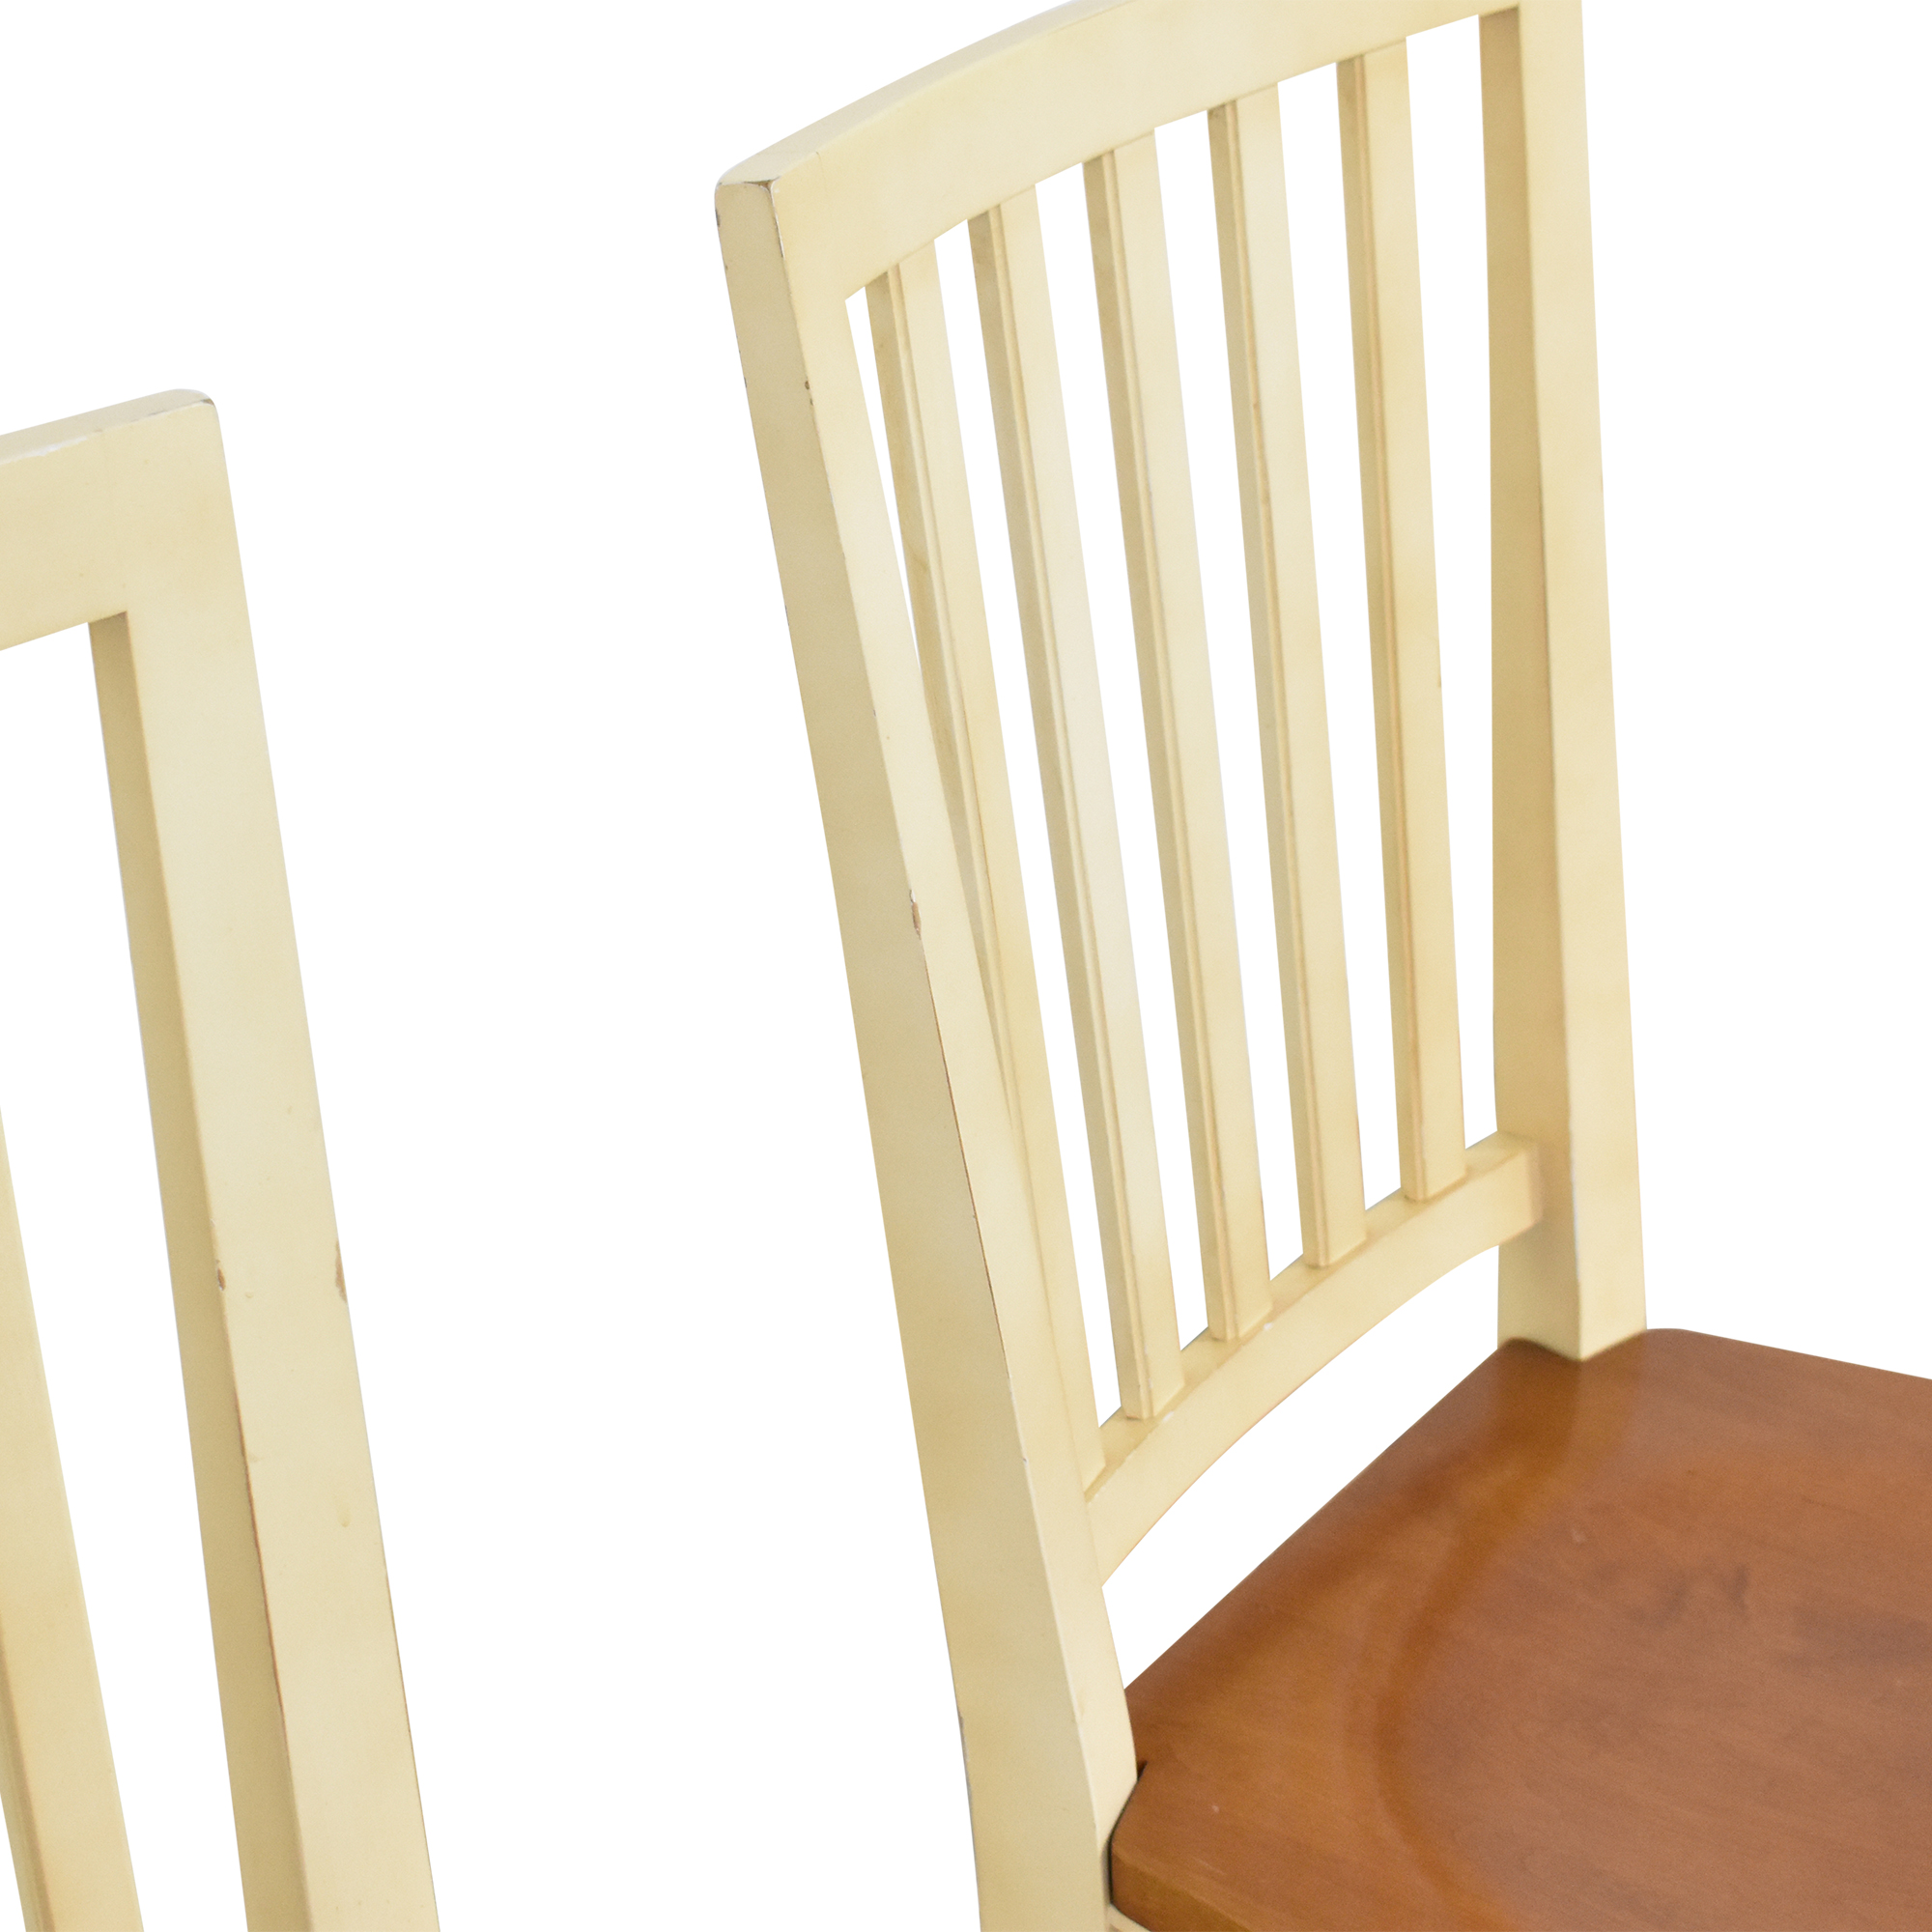 Ethan Allen Dining Chairs Ethan Allen